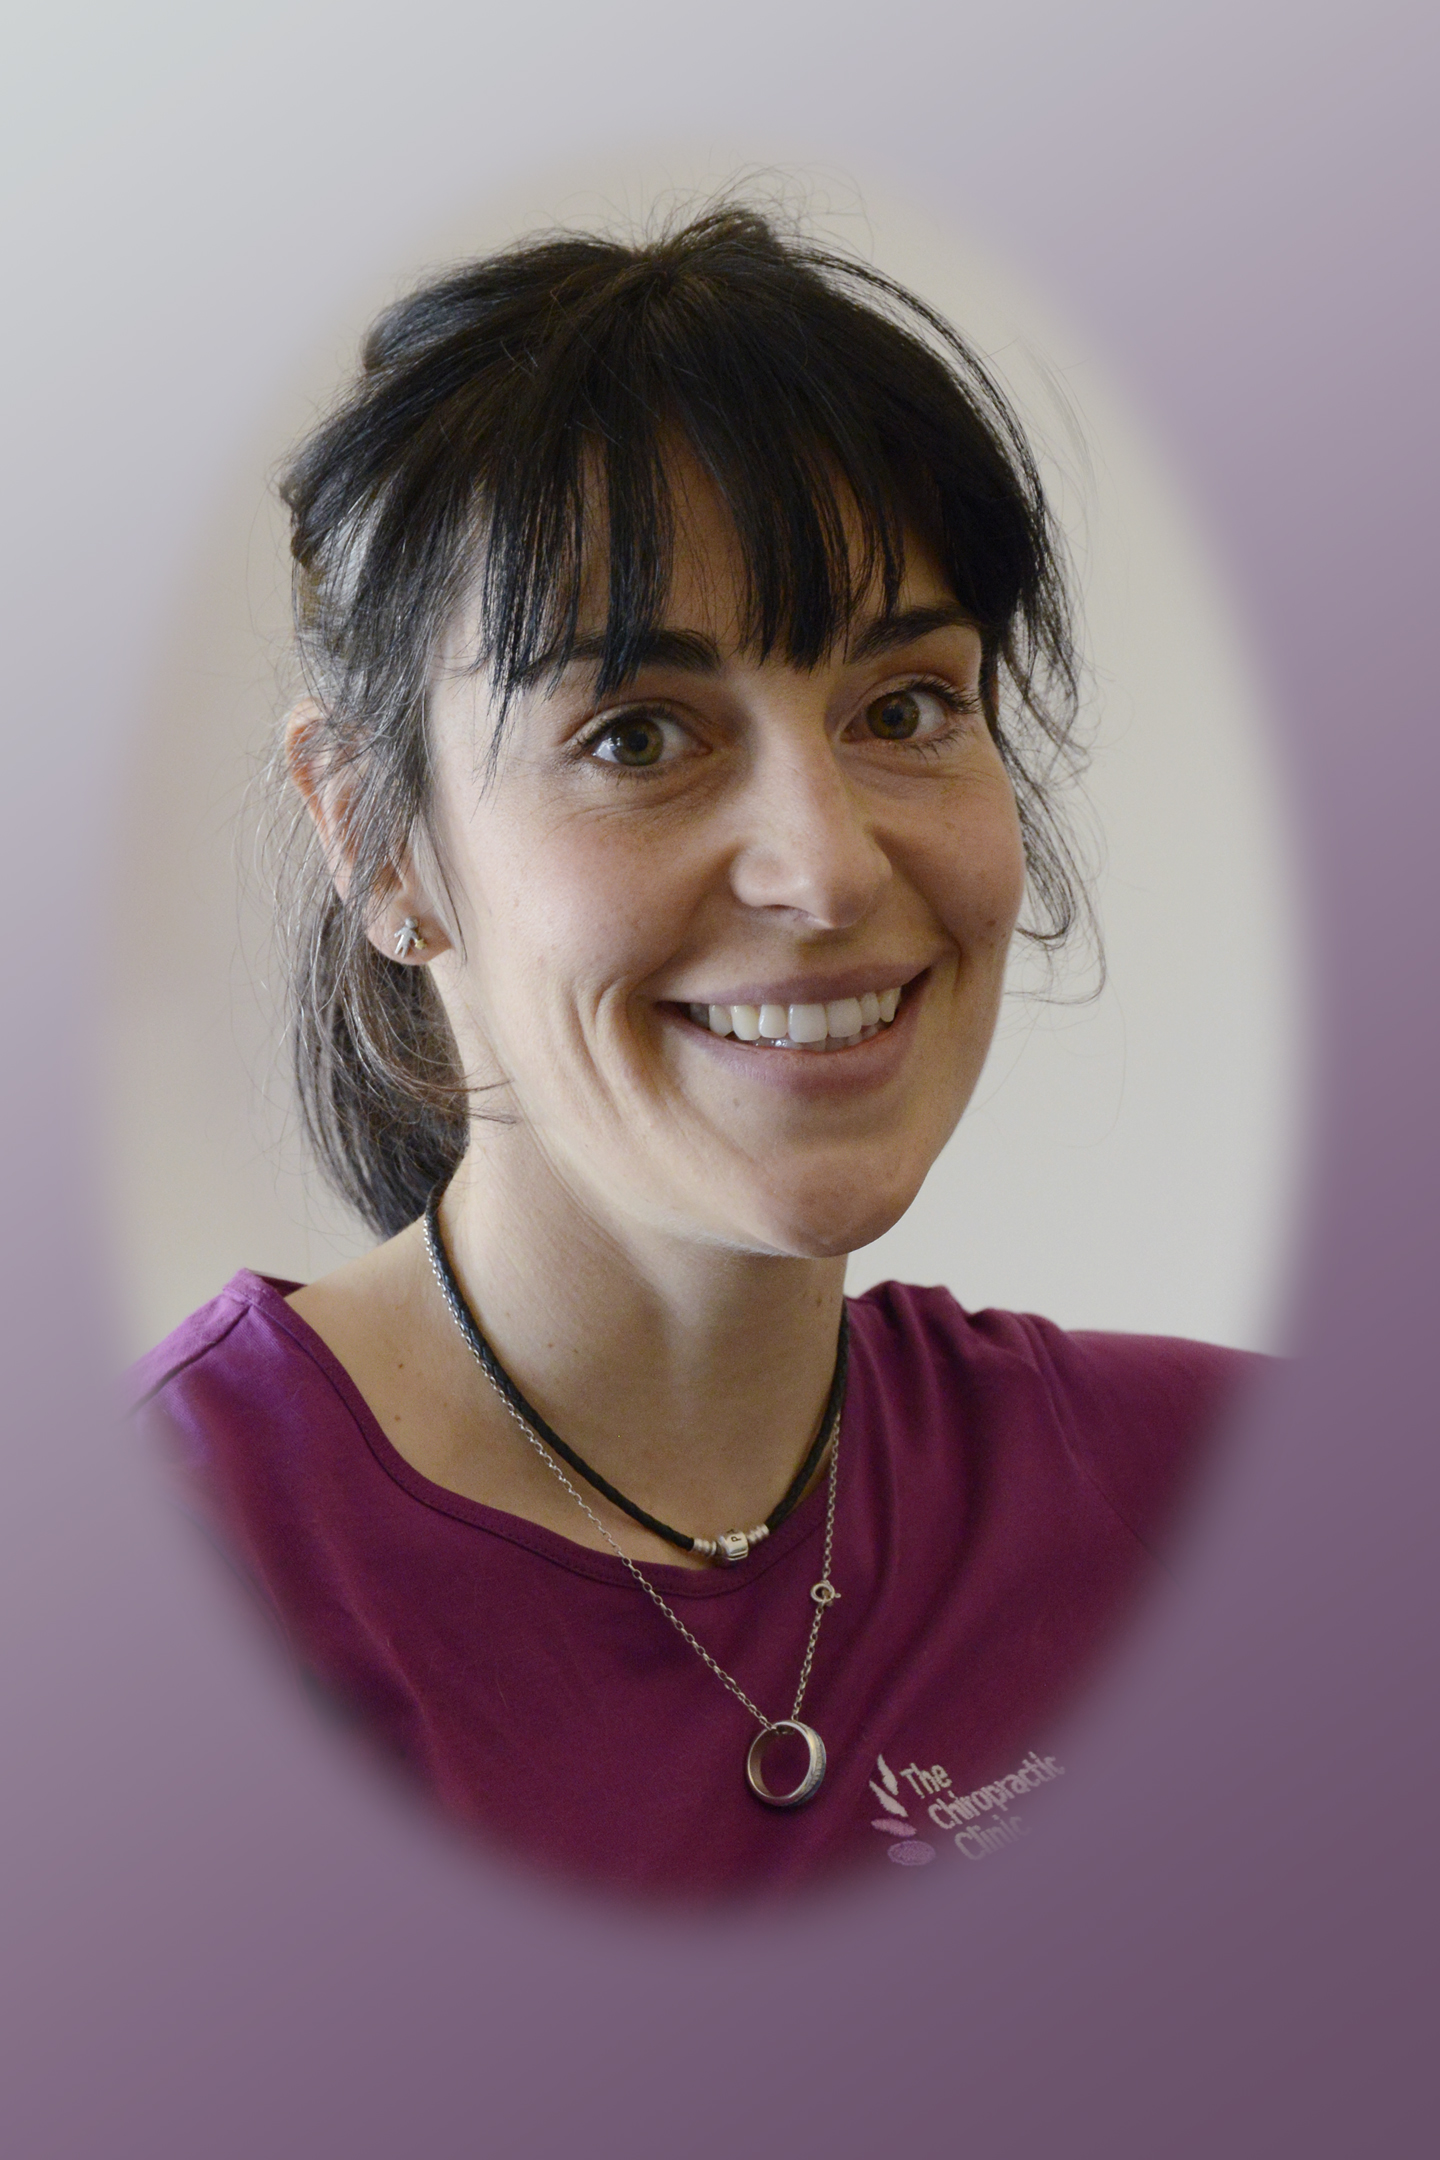 Sarah Bloom BSc (Hons) MChiro